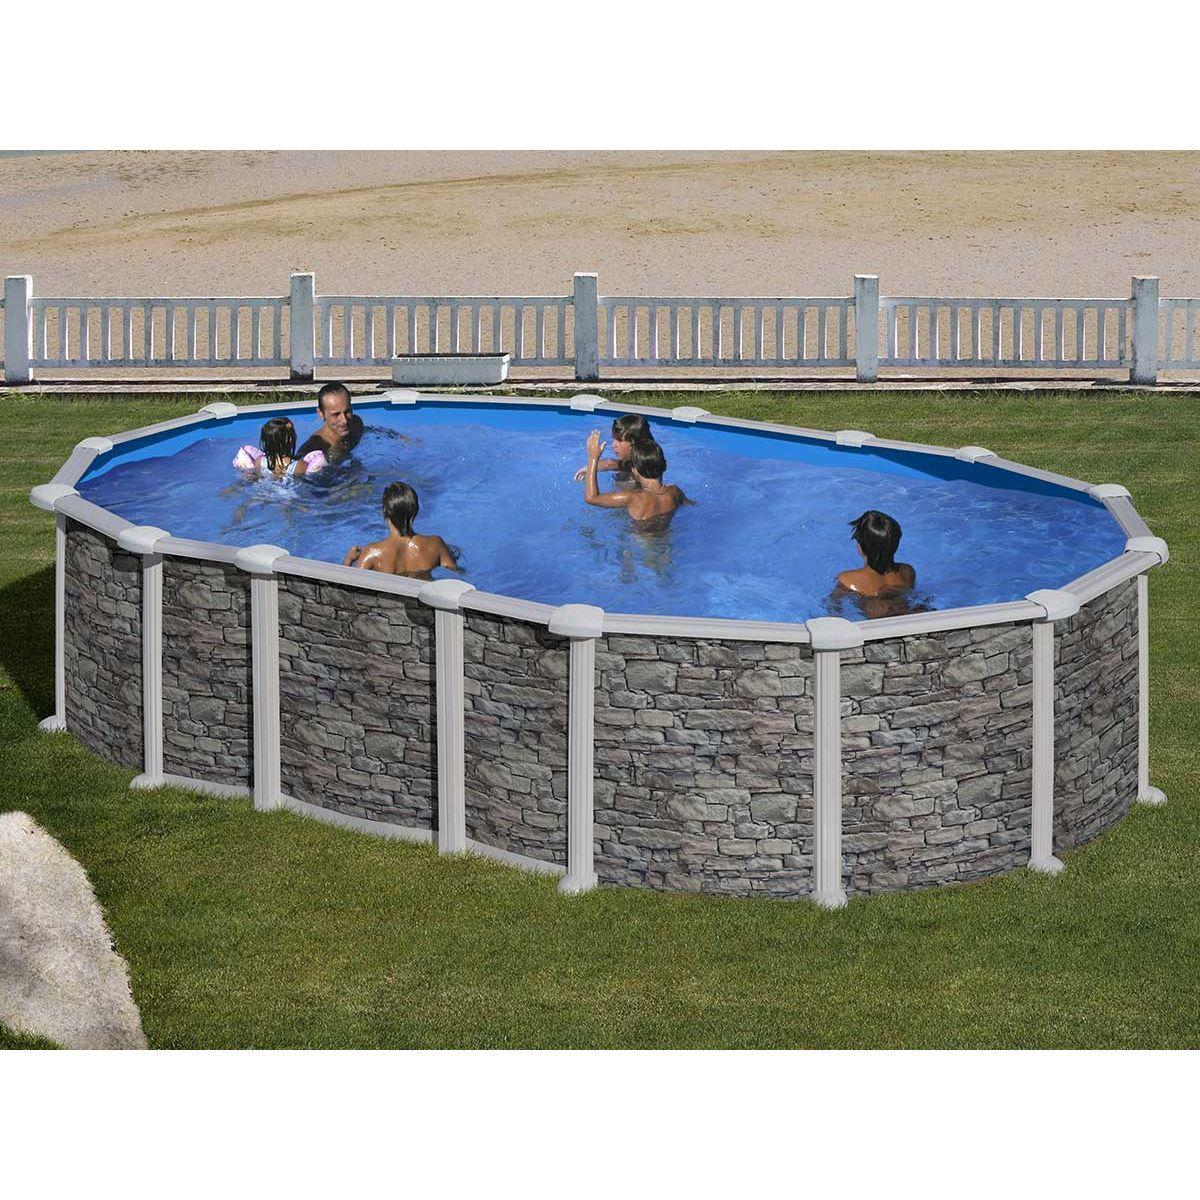 Piscine En Pierre Hors Sol piscine acier aspect pierre santorini ovale - gré | piscine